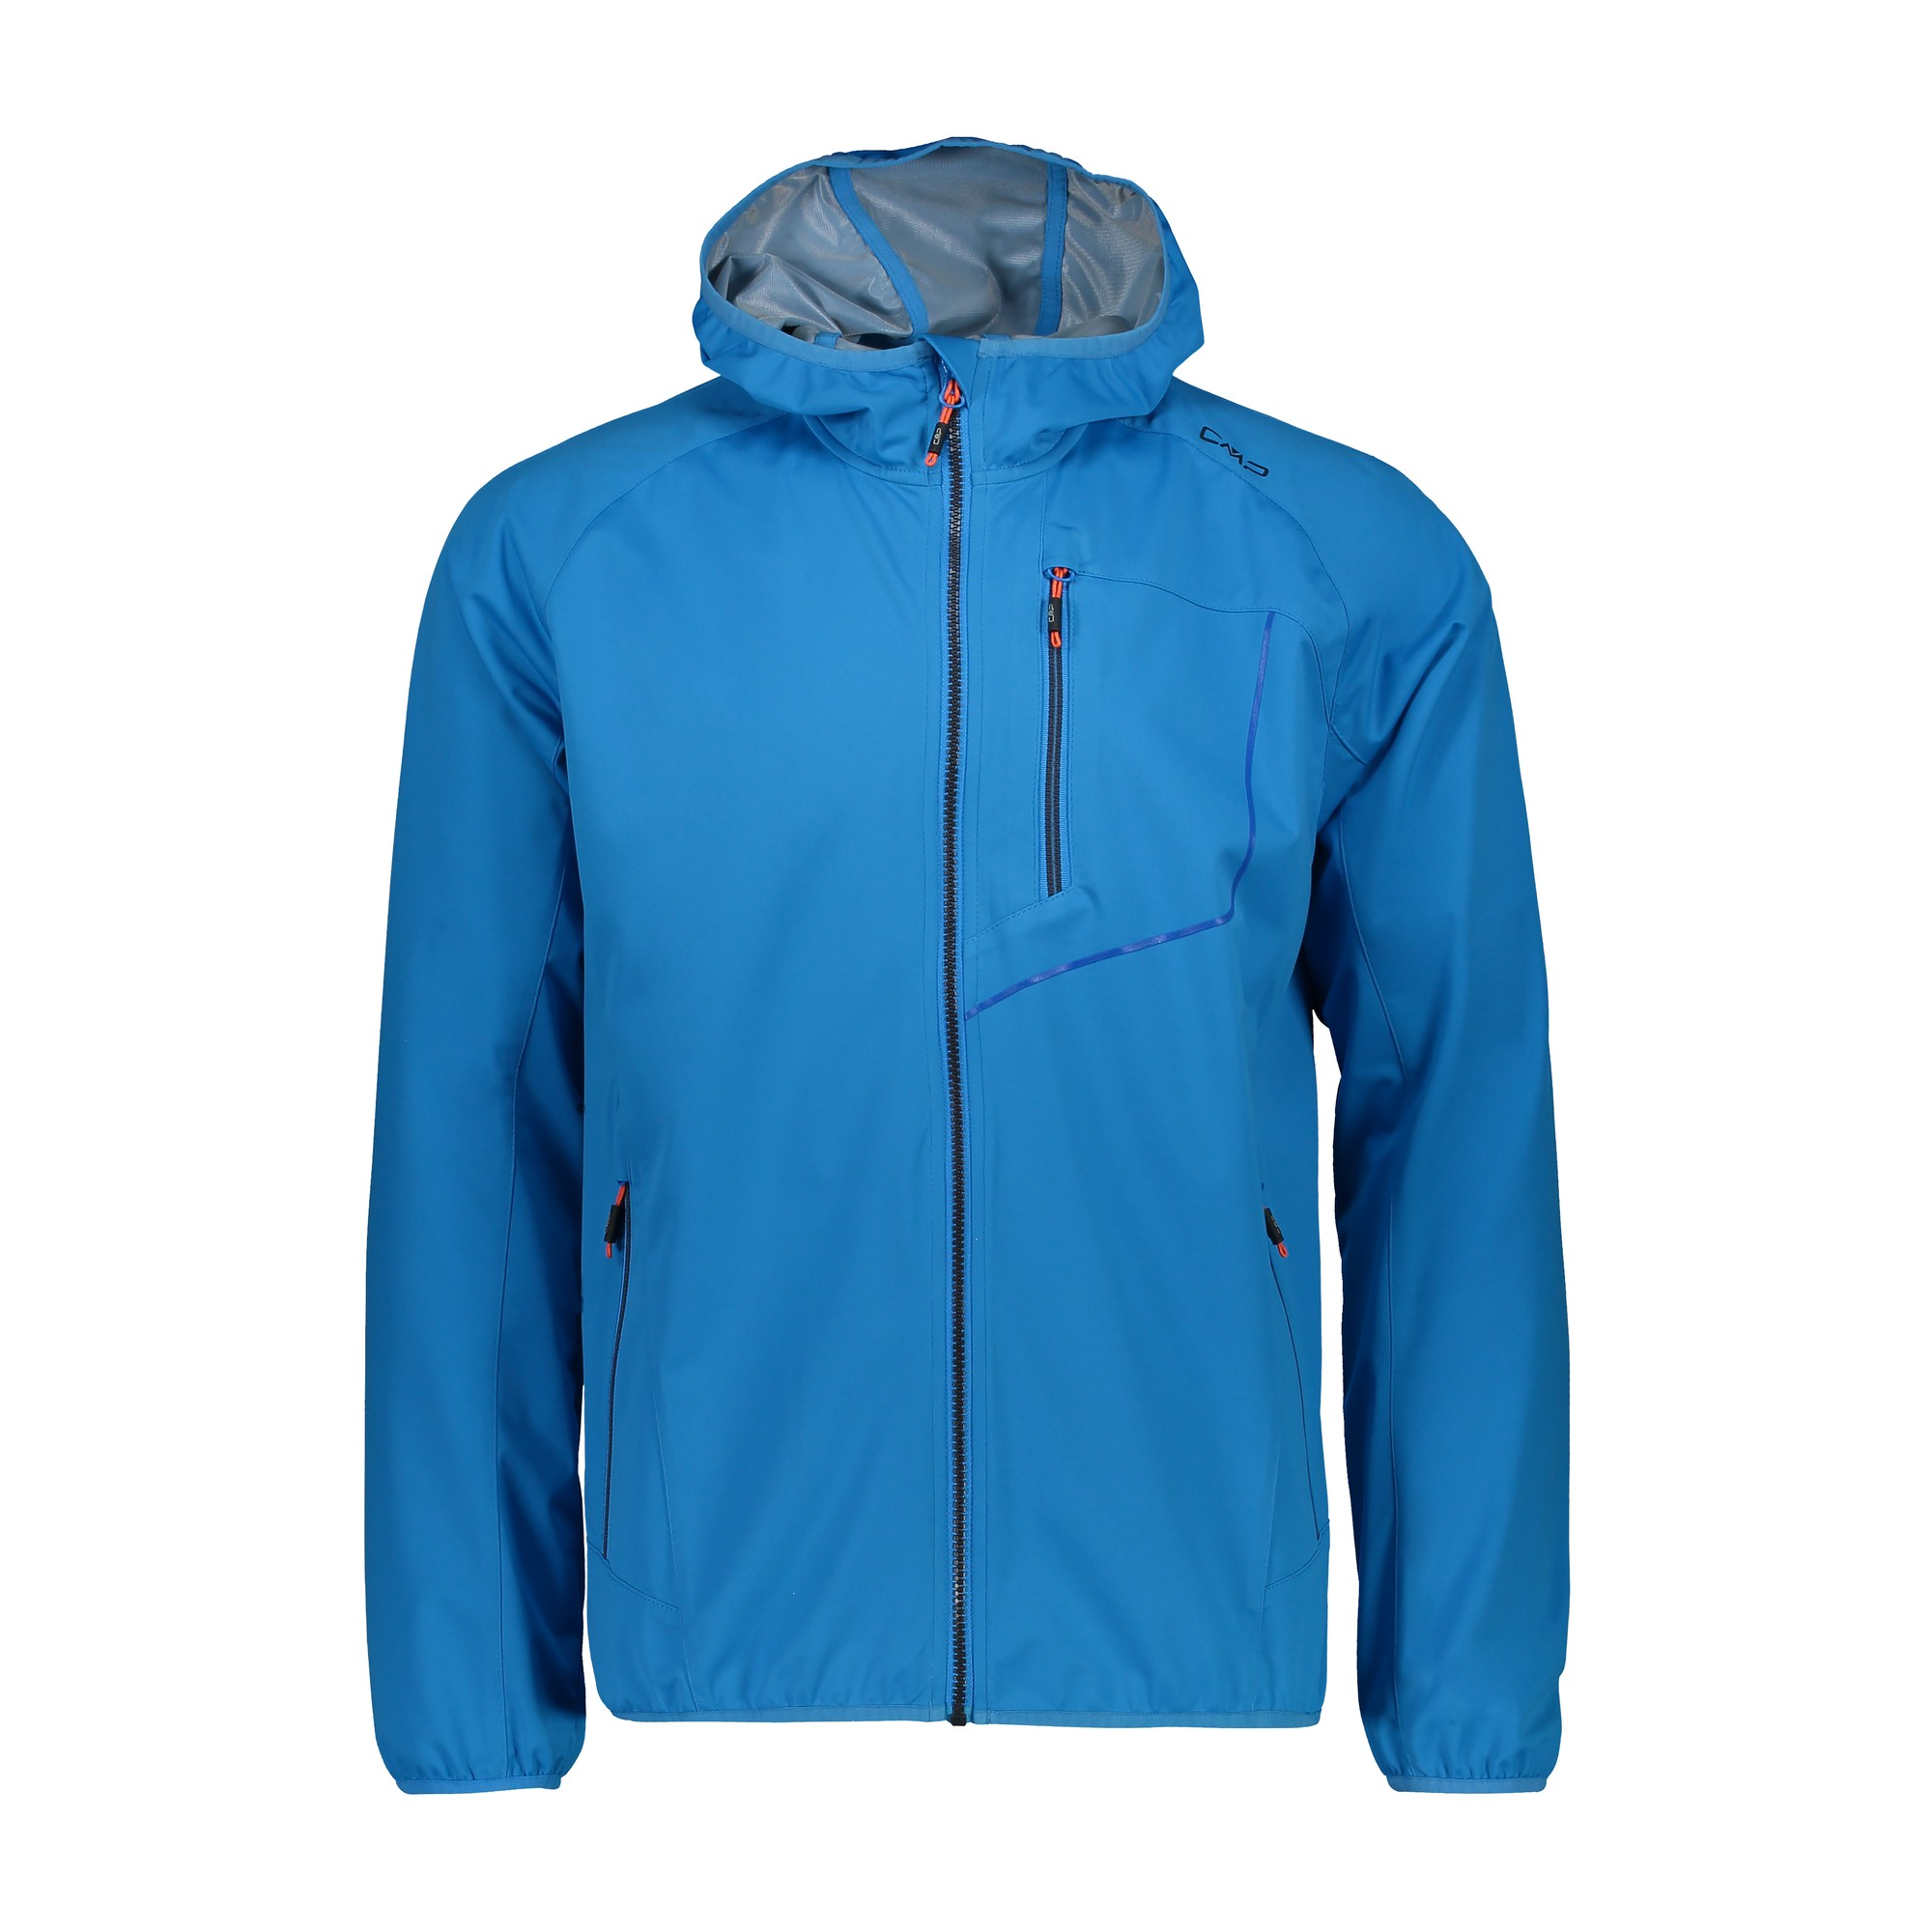 Details about CMP Softshell Jacket Man Jacket Fix Hood Blau Windproof Waterproof Lightweight